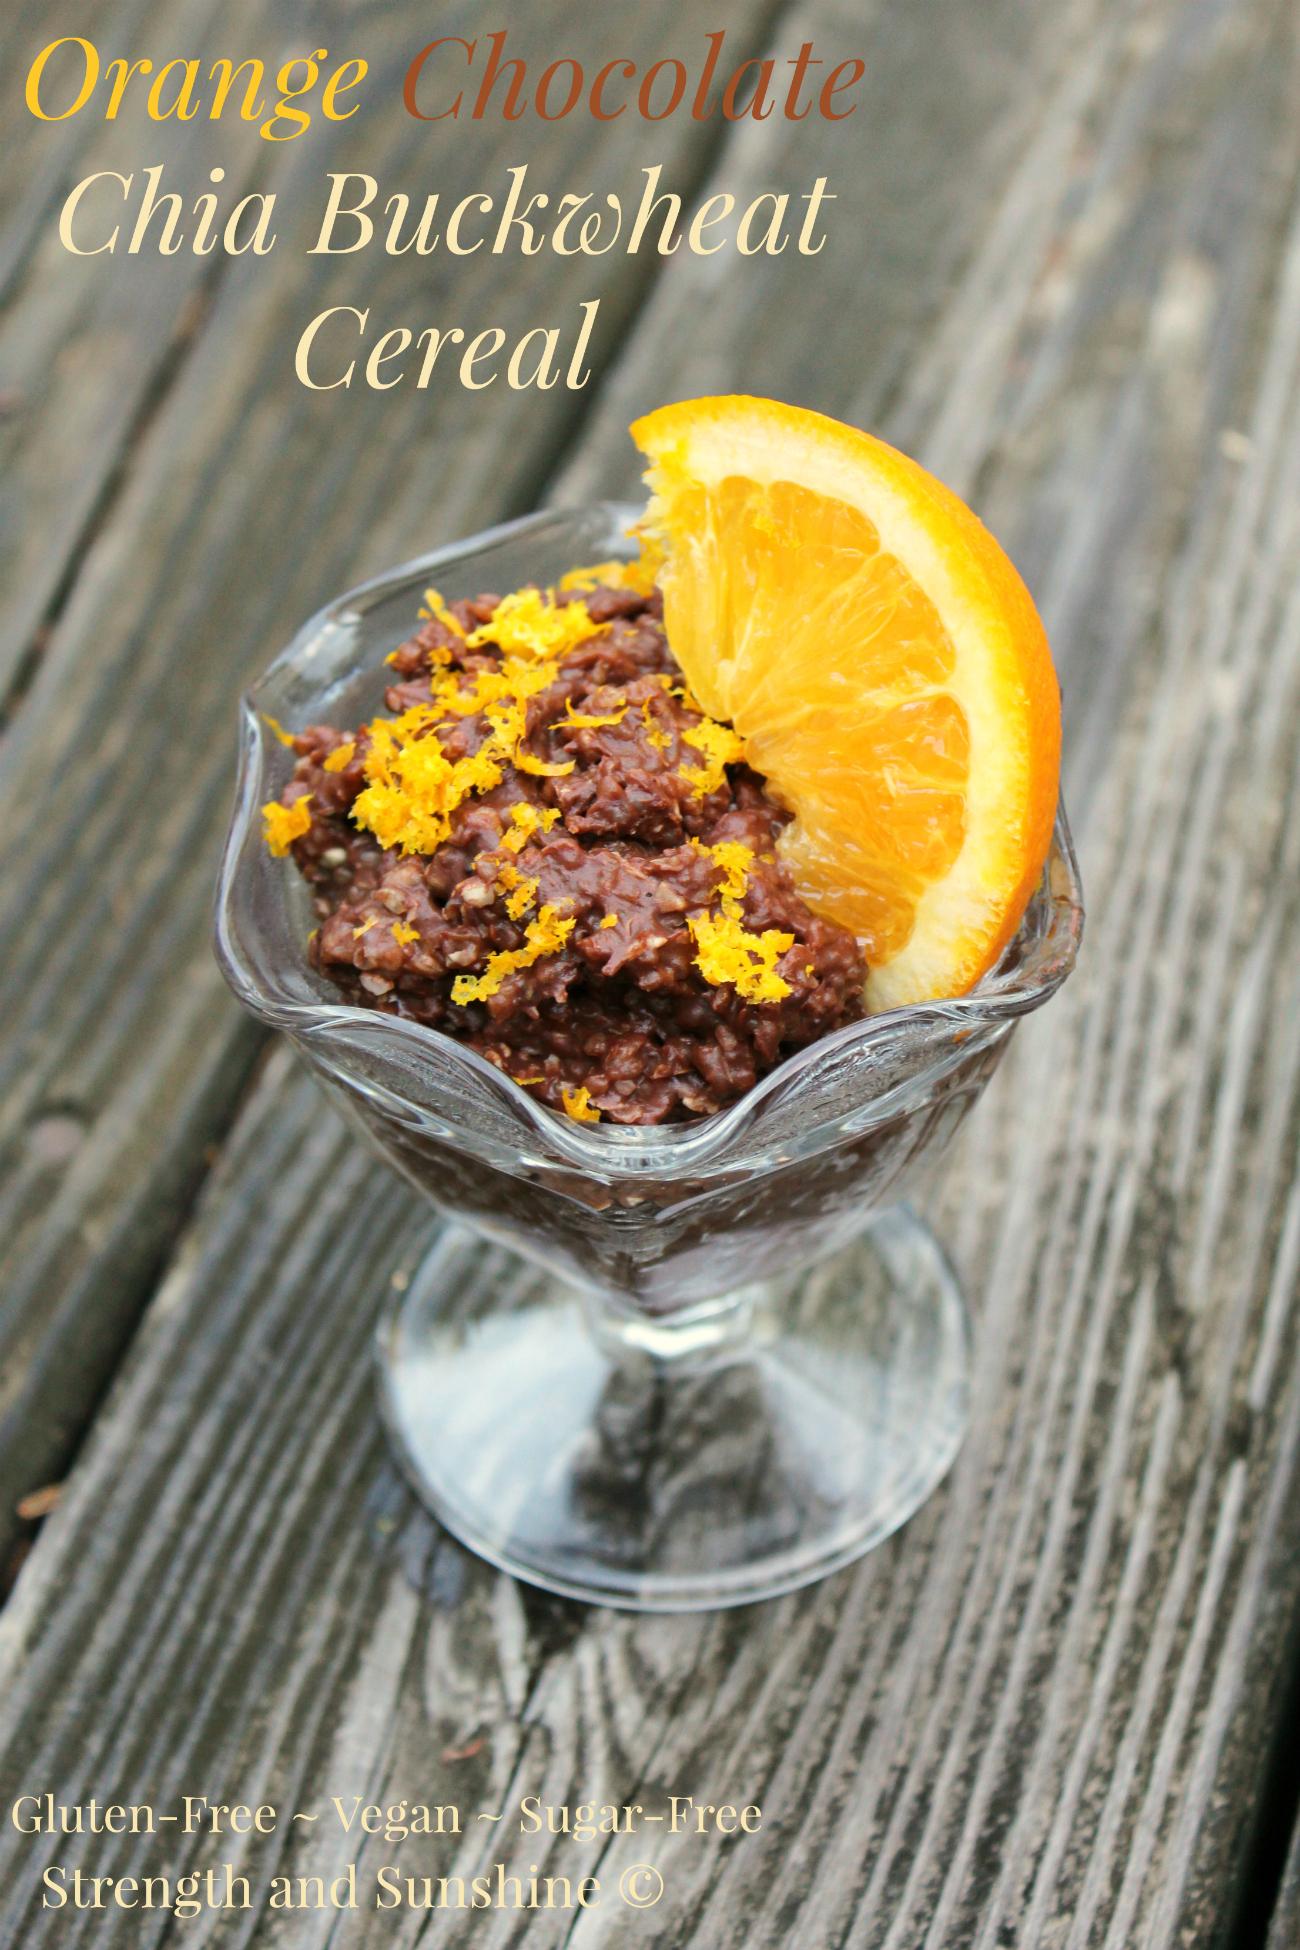 Orange Chocolate Chia Buckwheat Cereal | Strength and Sunshine @RebeccaGF666 #breakfast #buckwheat #chocolate #orange #glutenfree #vegan